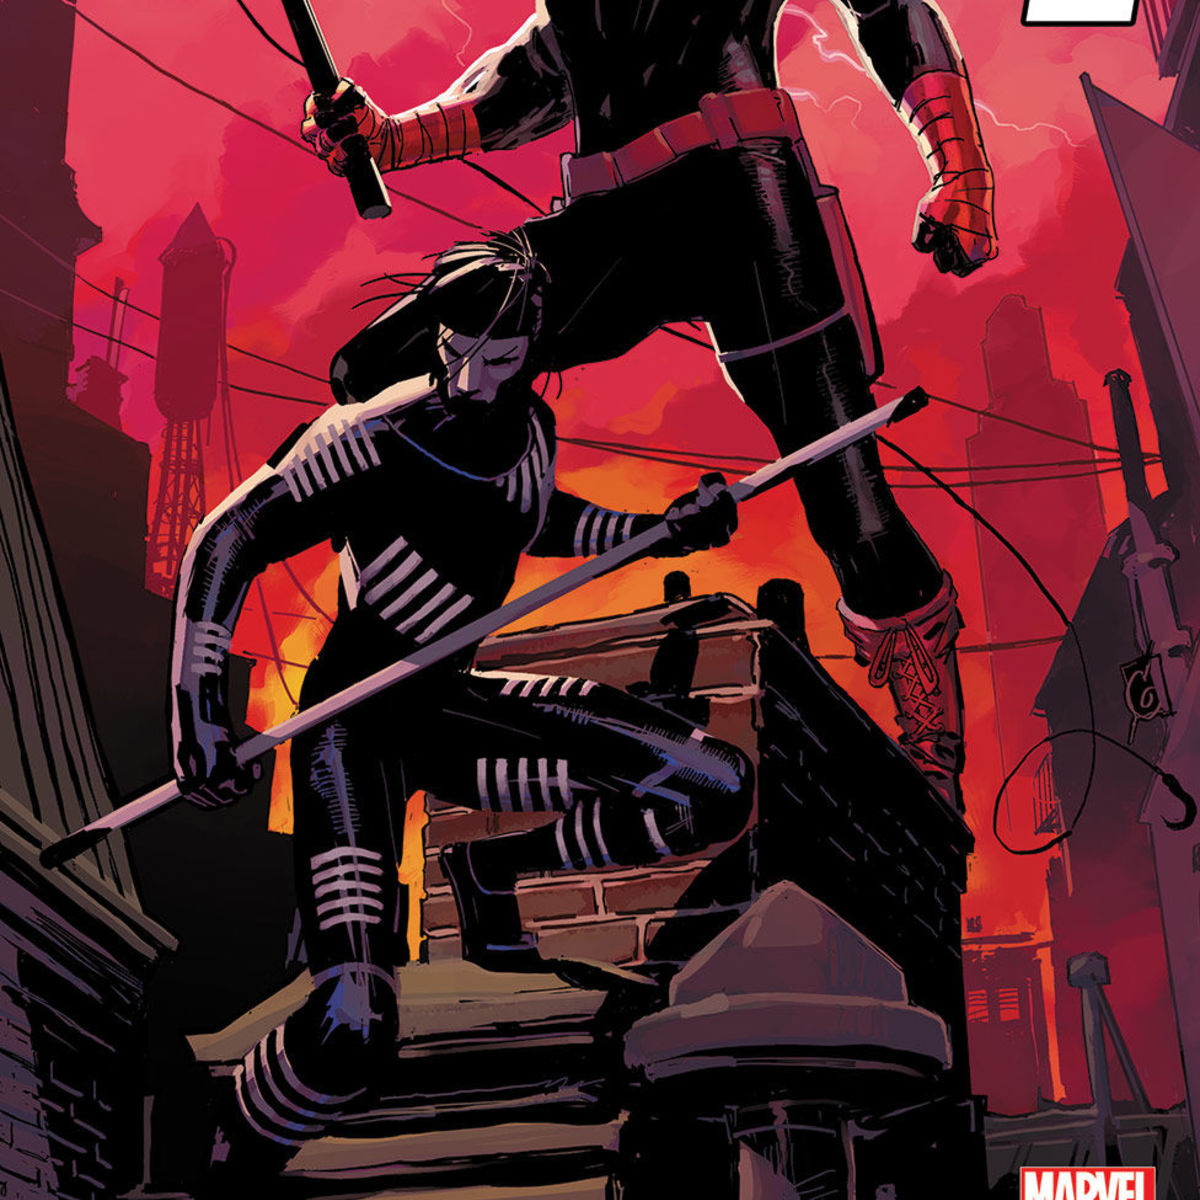 Daredevil #1 with Blindspot Ron Garney